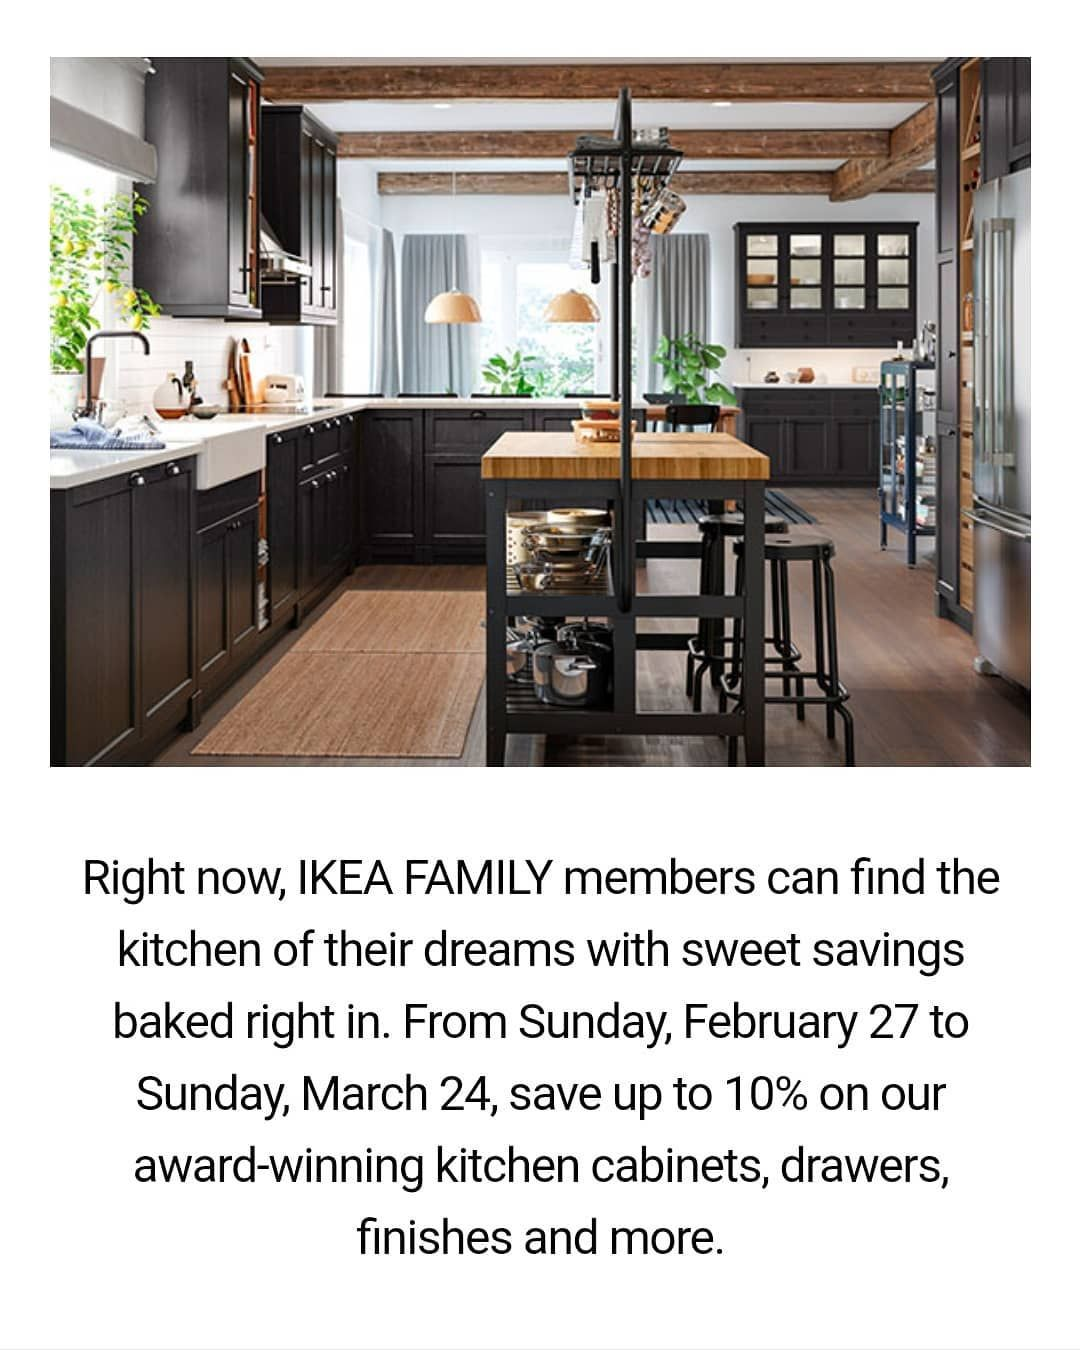 Spring Kitchen Event Kitchencountertops Ikeakitchen Bb Dreamkitchen Kitchenremodel Kitchendesign Interiordesign